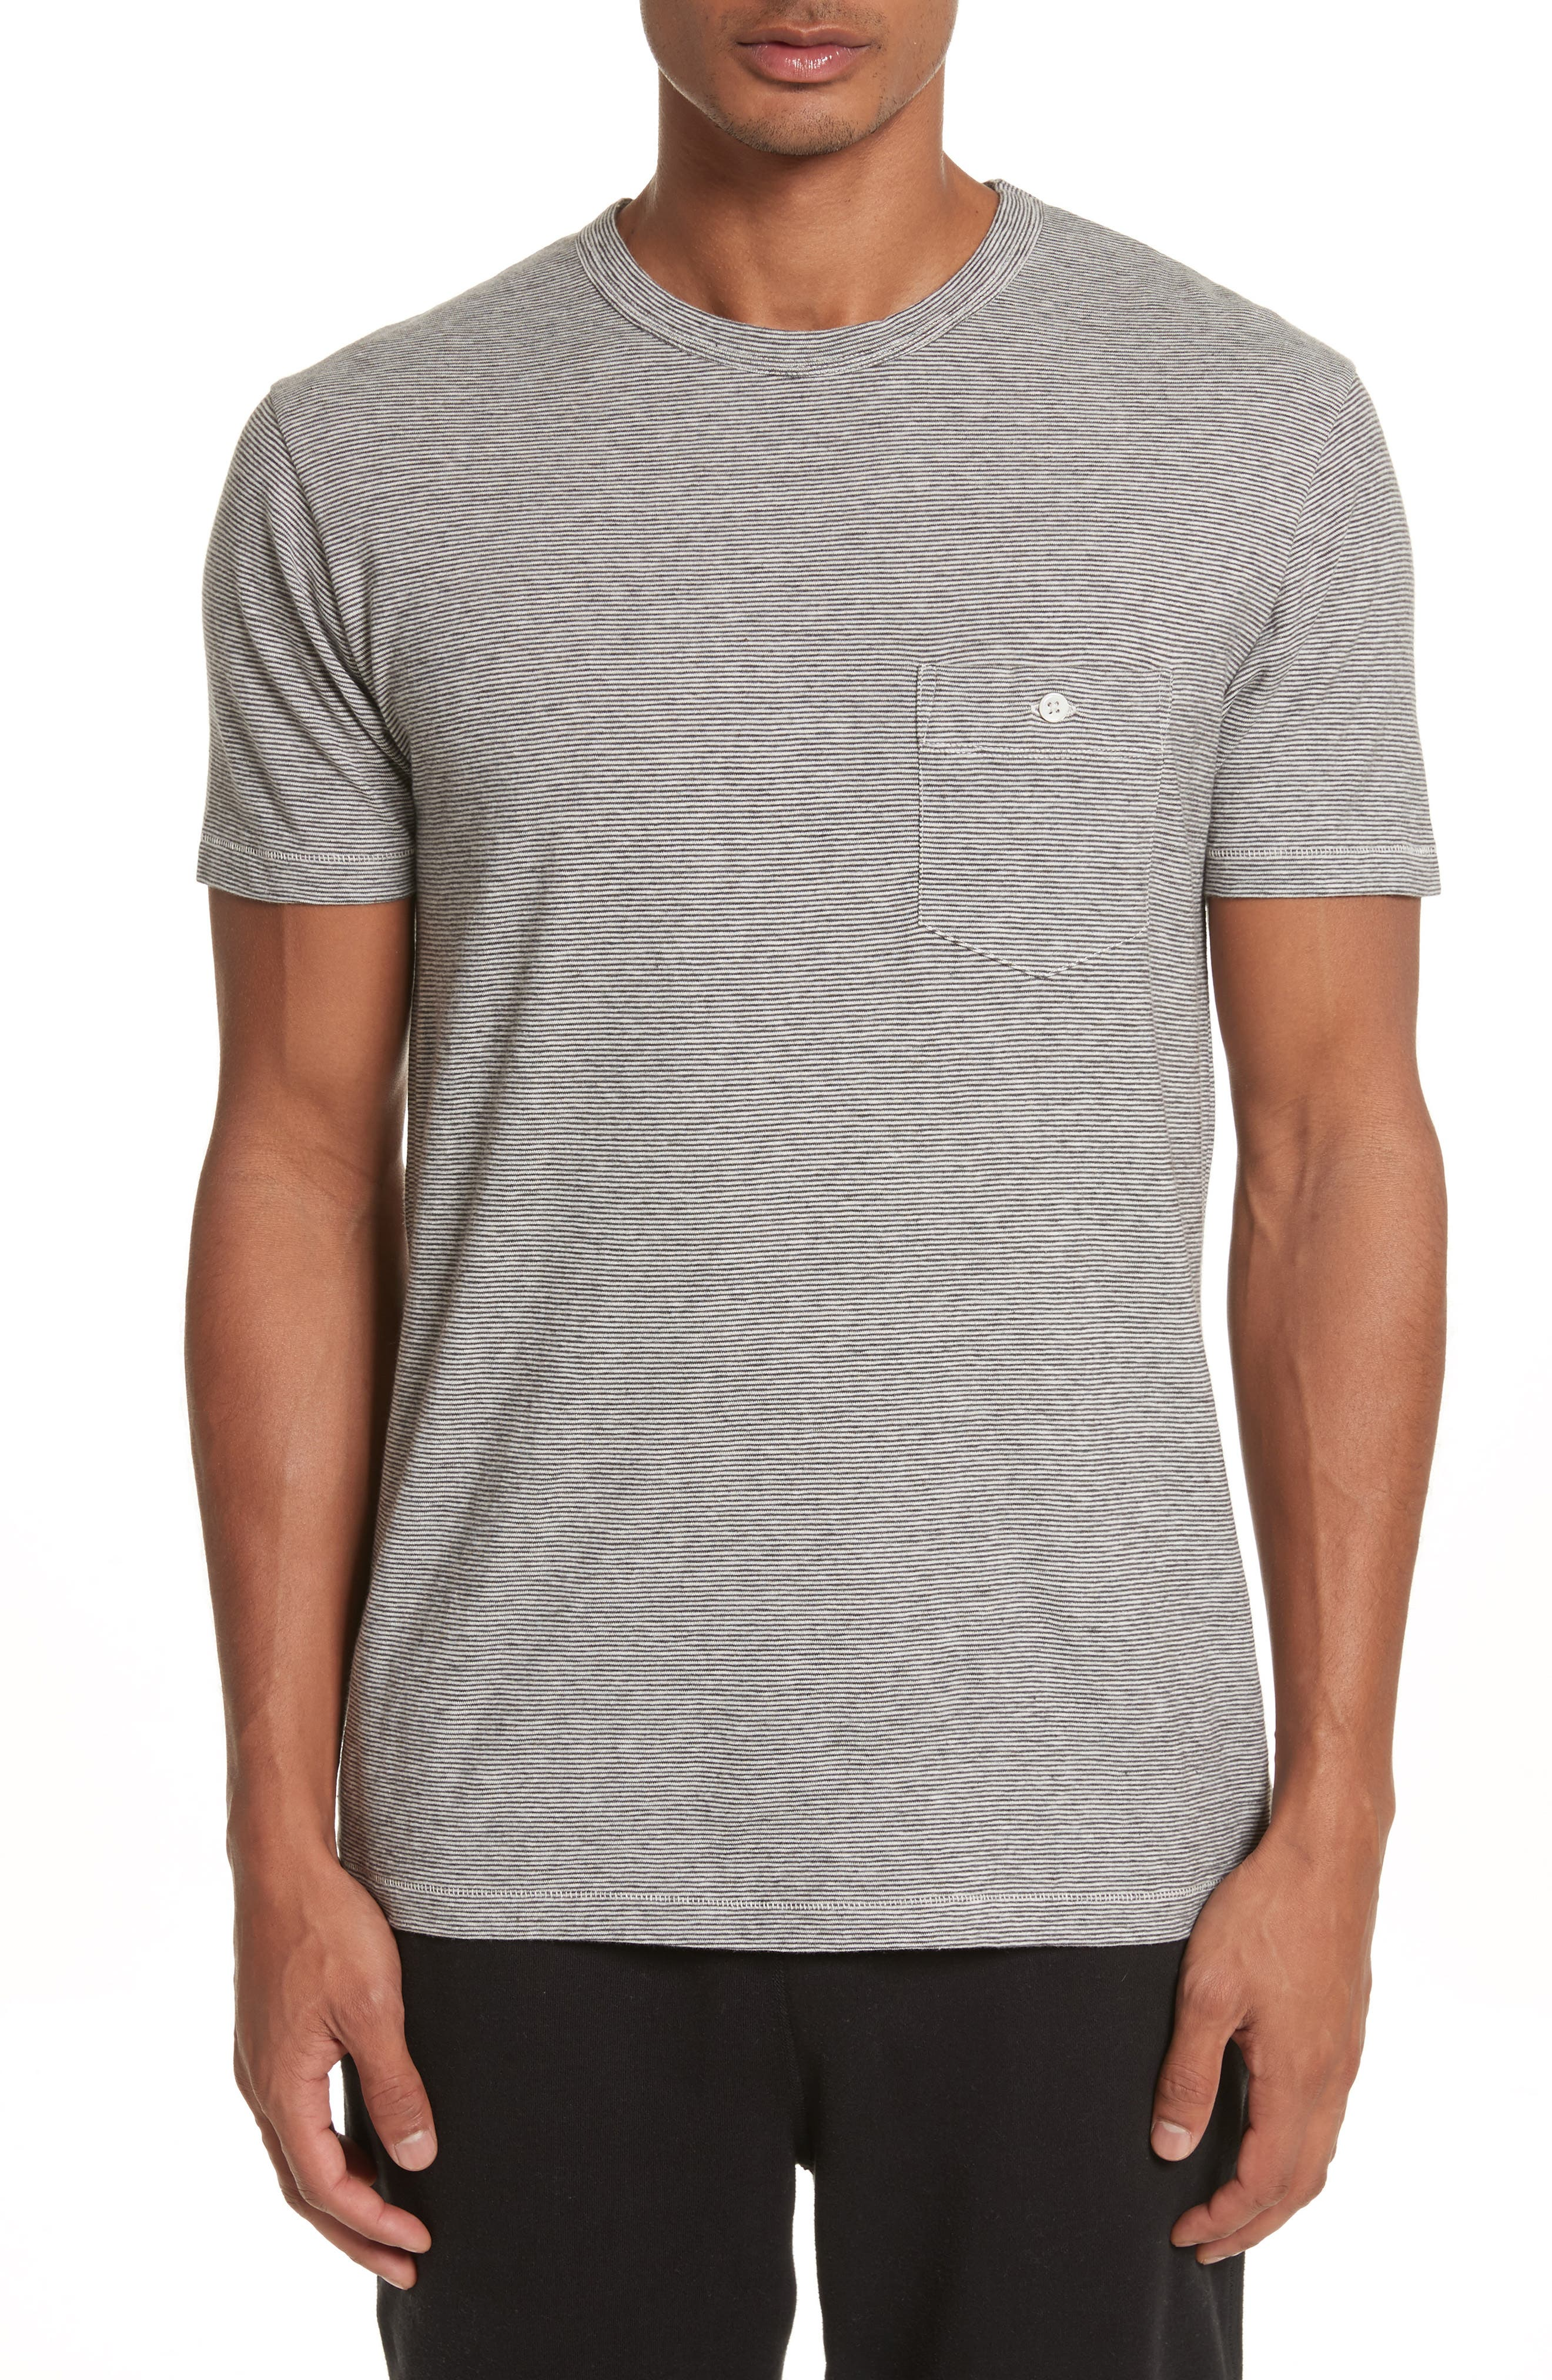 Main Image - Todd Snyder Microstripe Pocket T-Shirt